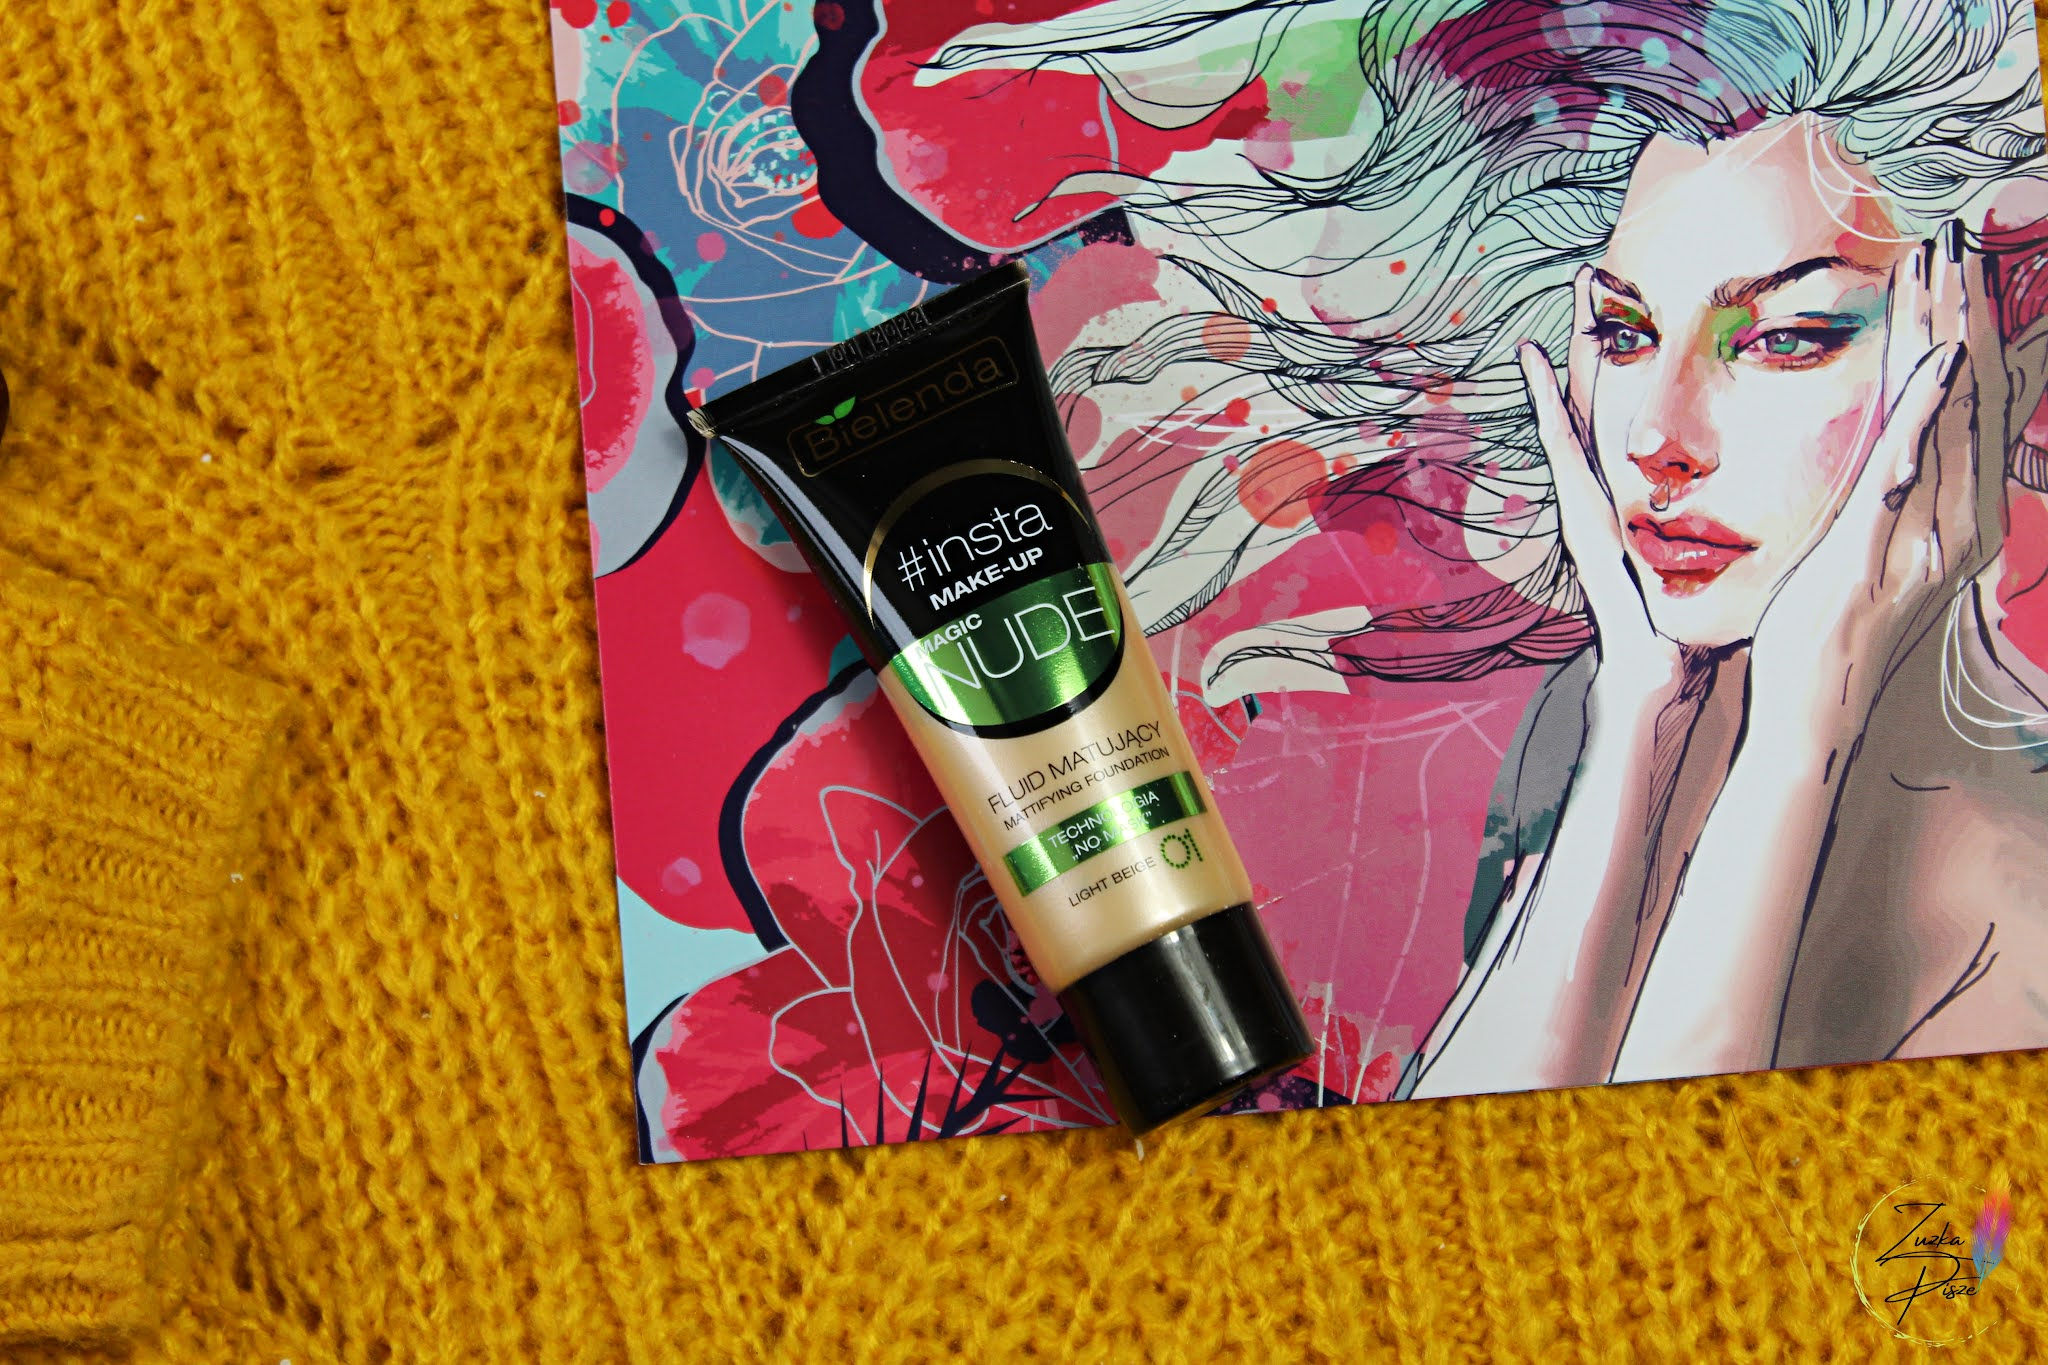 BIELENDA #Insta Make-up Magic Nude - podkład matujący